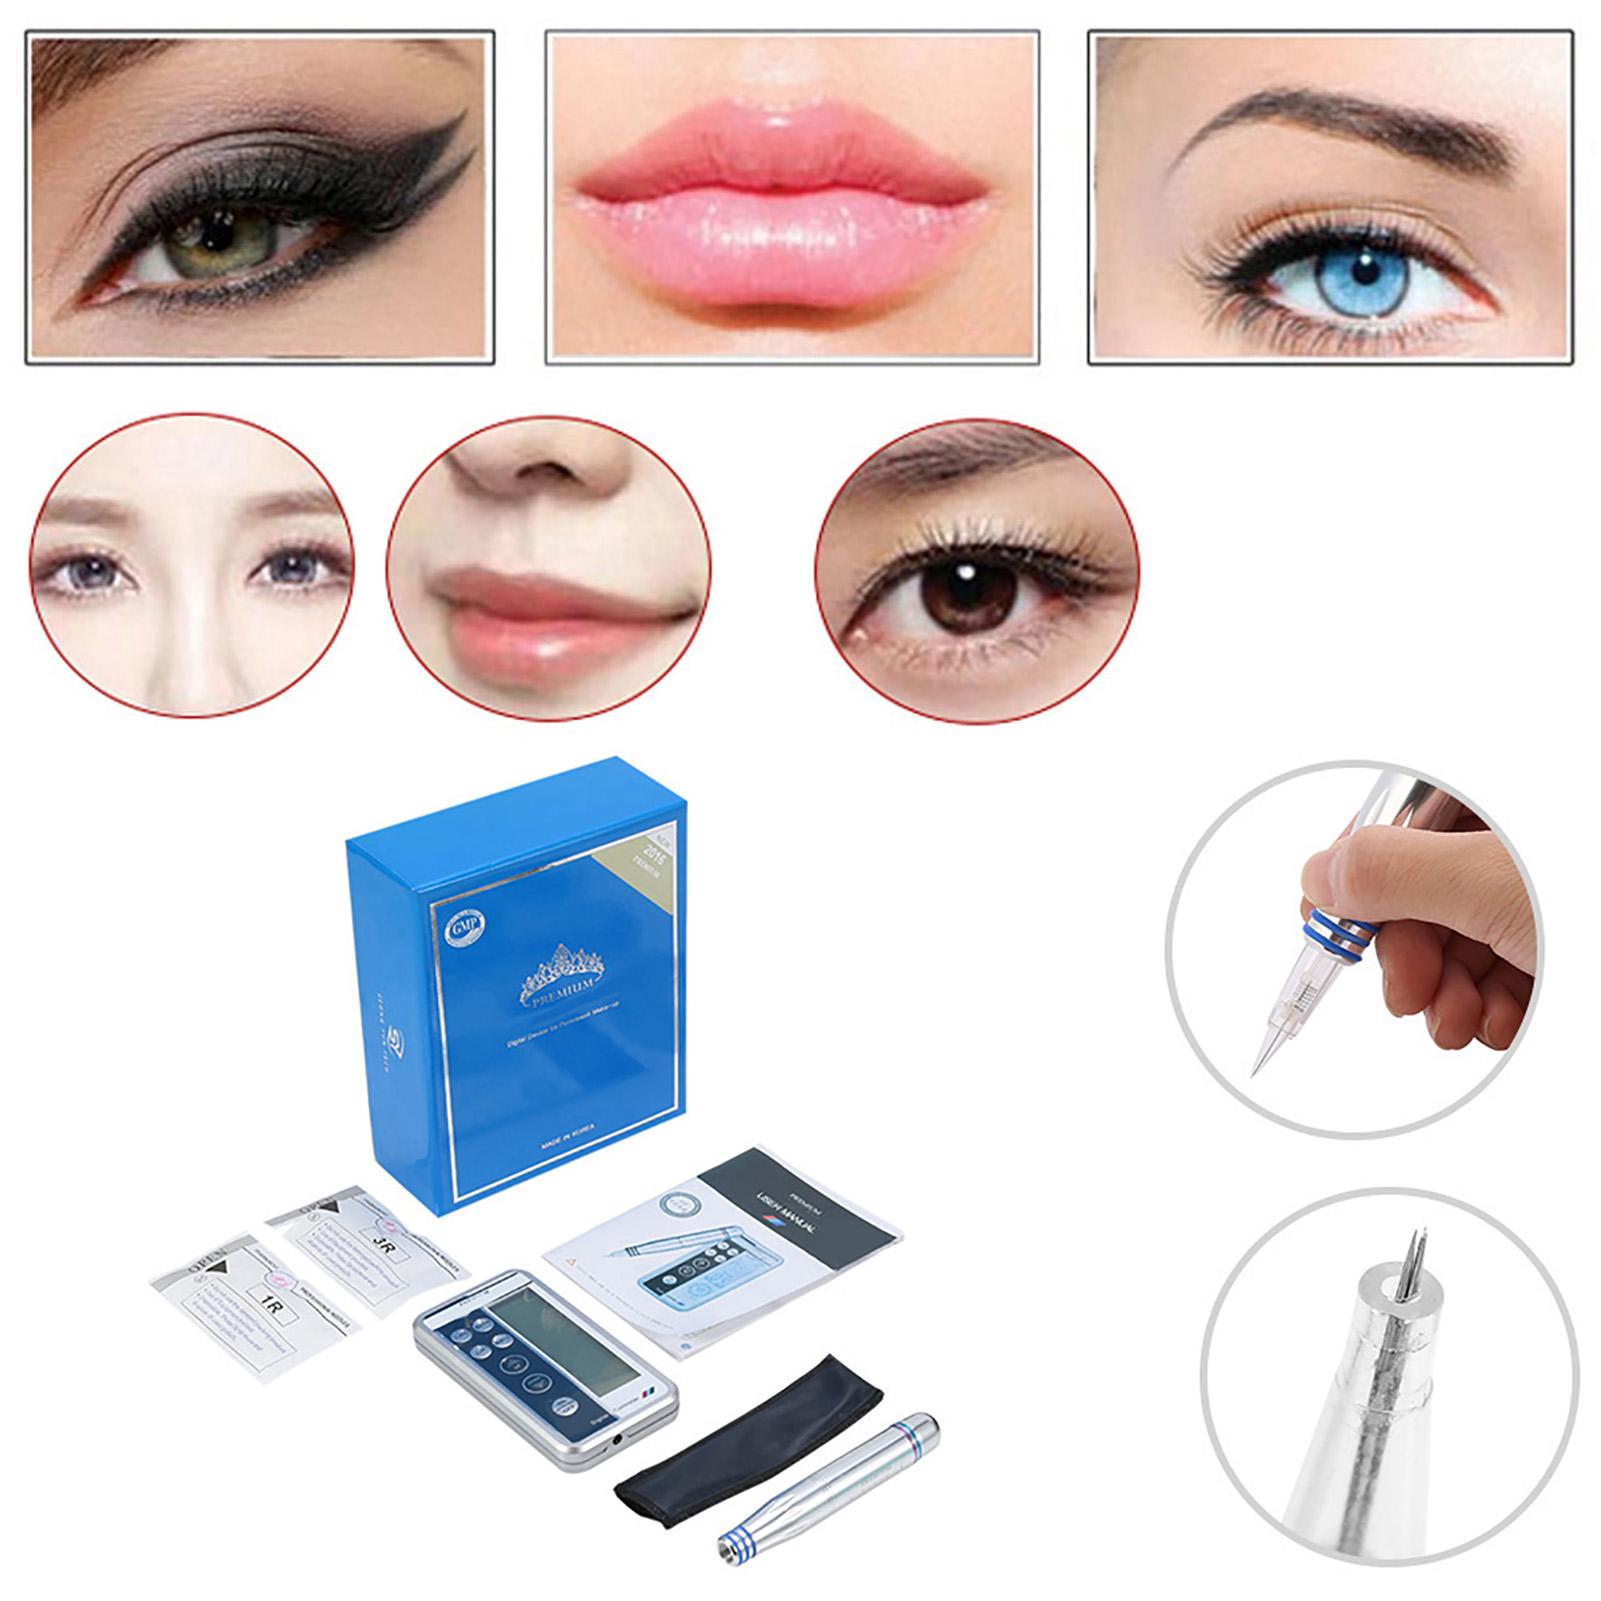 Digital-Permanent-Eyeliner-Lip-Eyebrow-Maquillaje-Tatuaje-Pen-Pen-2-Agujas